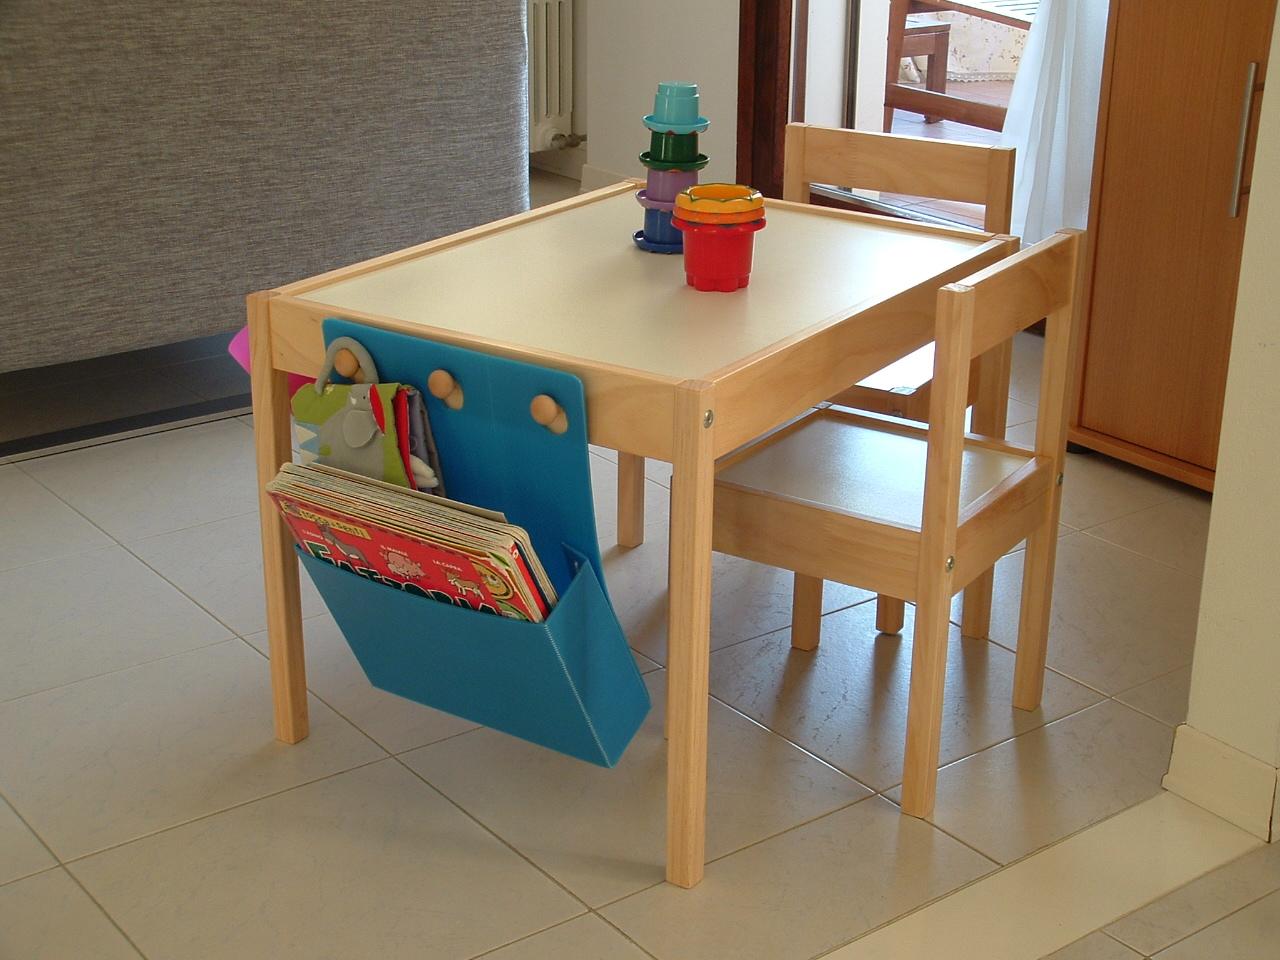 Plafoniera Bimbi Ikea : Settimino bambini plafoniera con abat jour per camera